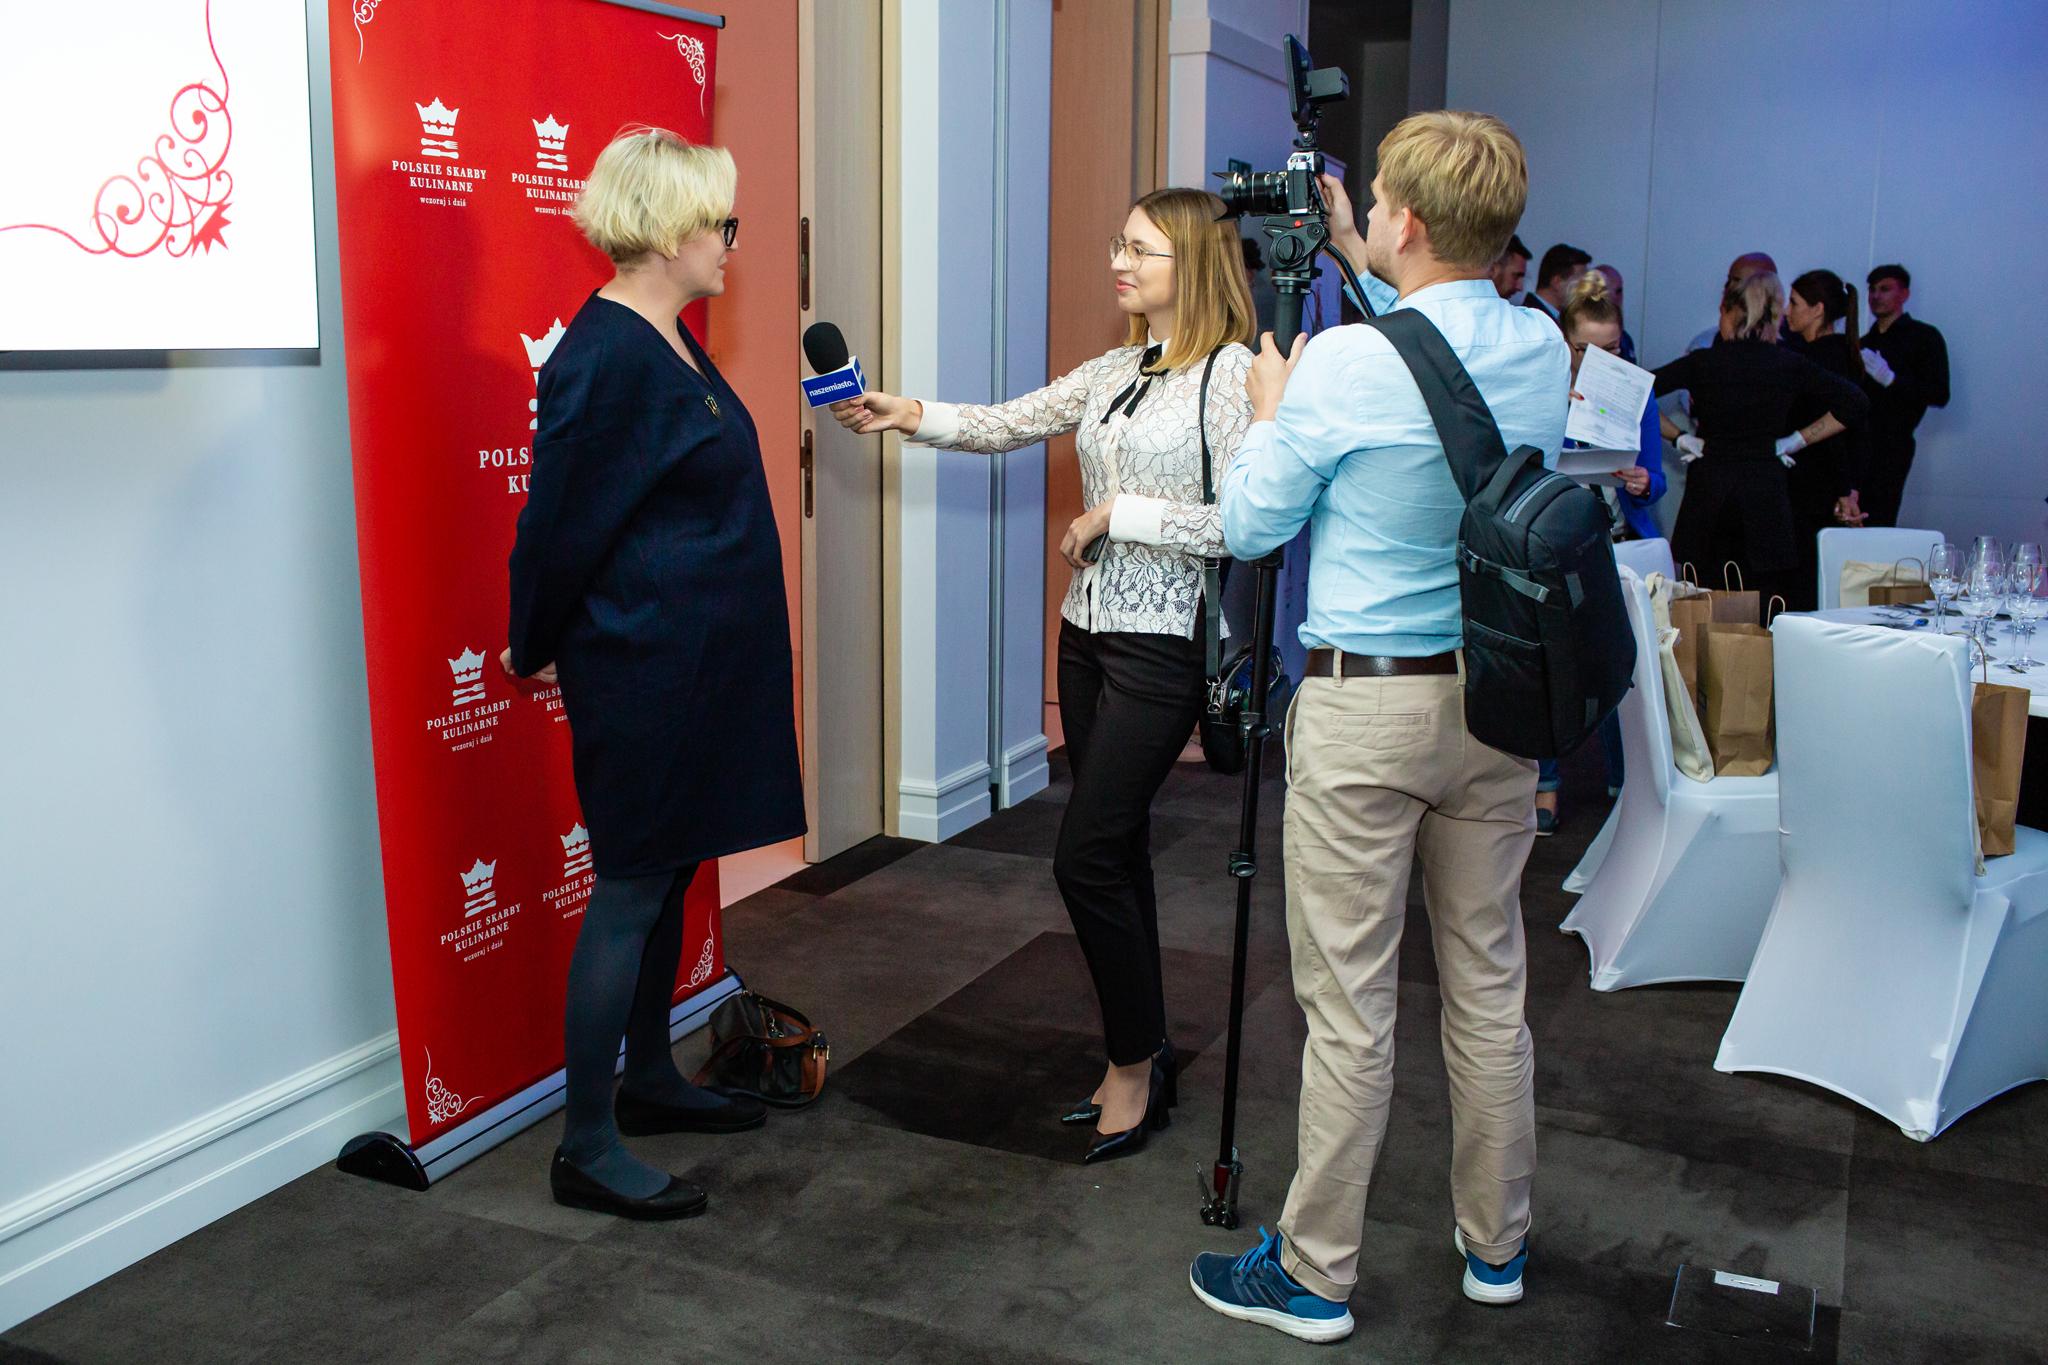 Magdalena Figurna, Menedżer ds. PR i Komunikacji Wewn